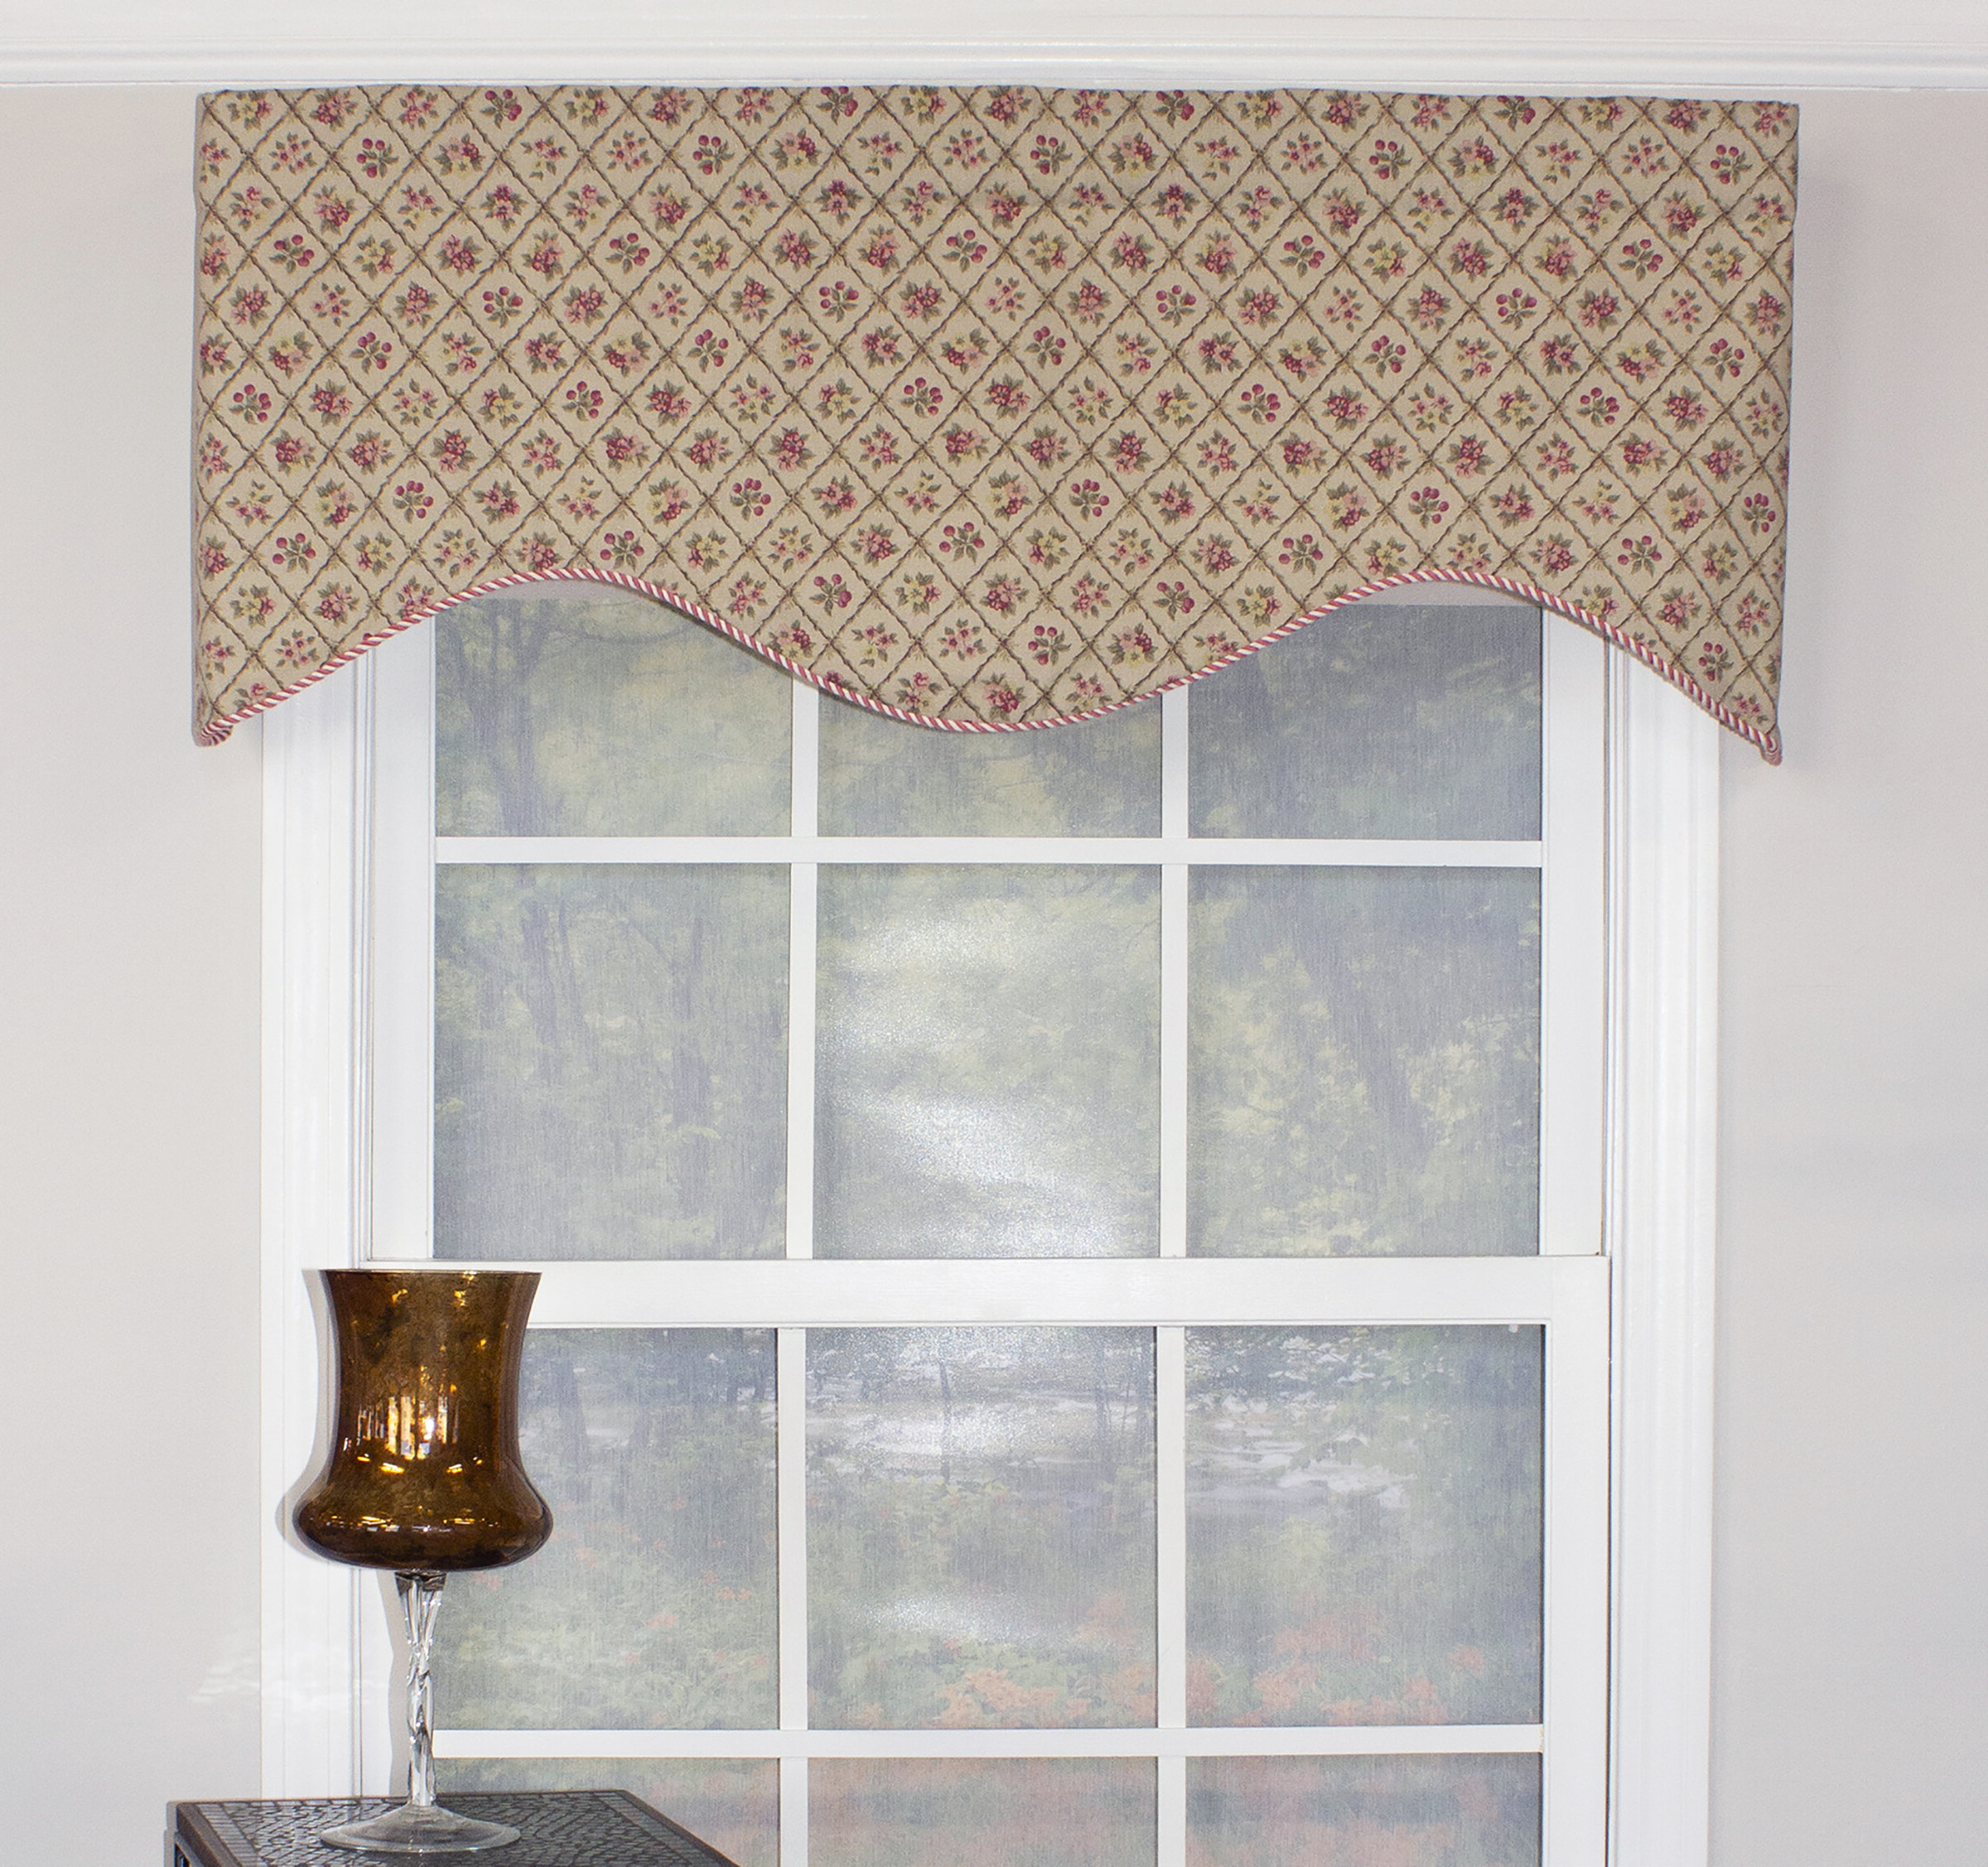 "Most Current Sydnie Petite Trellis 51"" Window Valance Regarding Trellis Pattern Window Valances (View 9 of 20)"